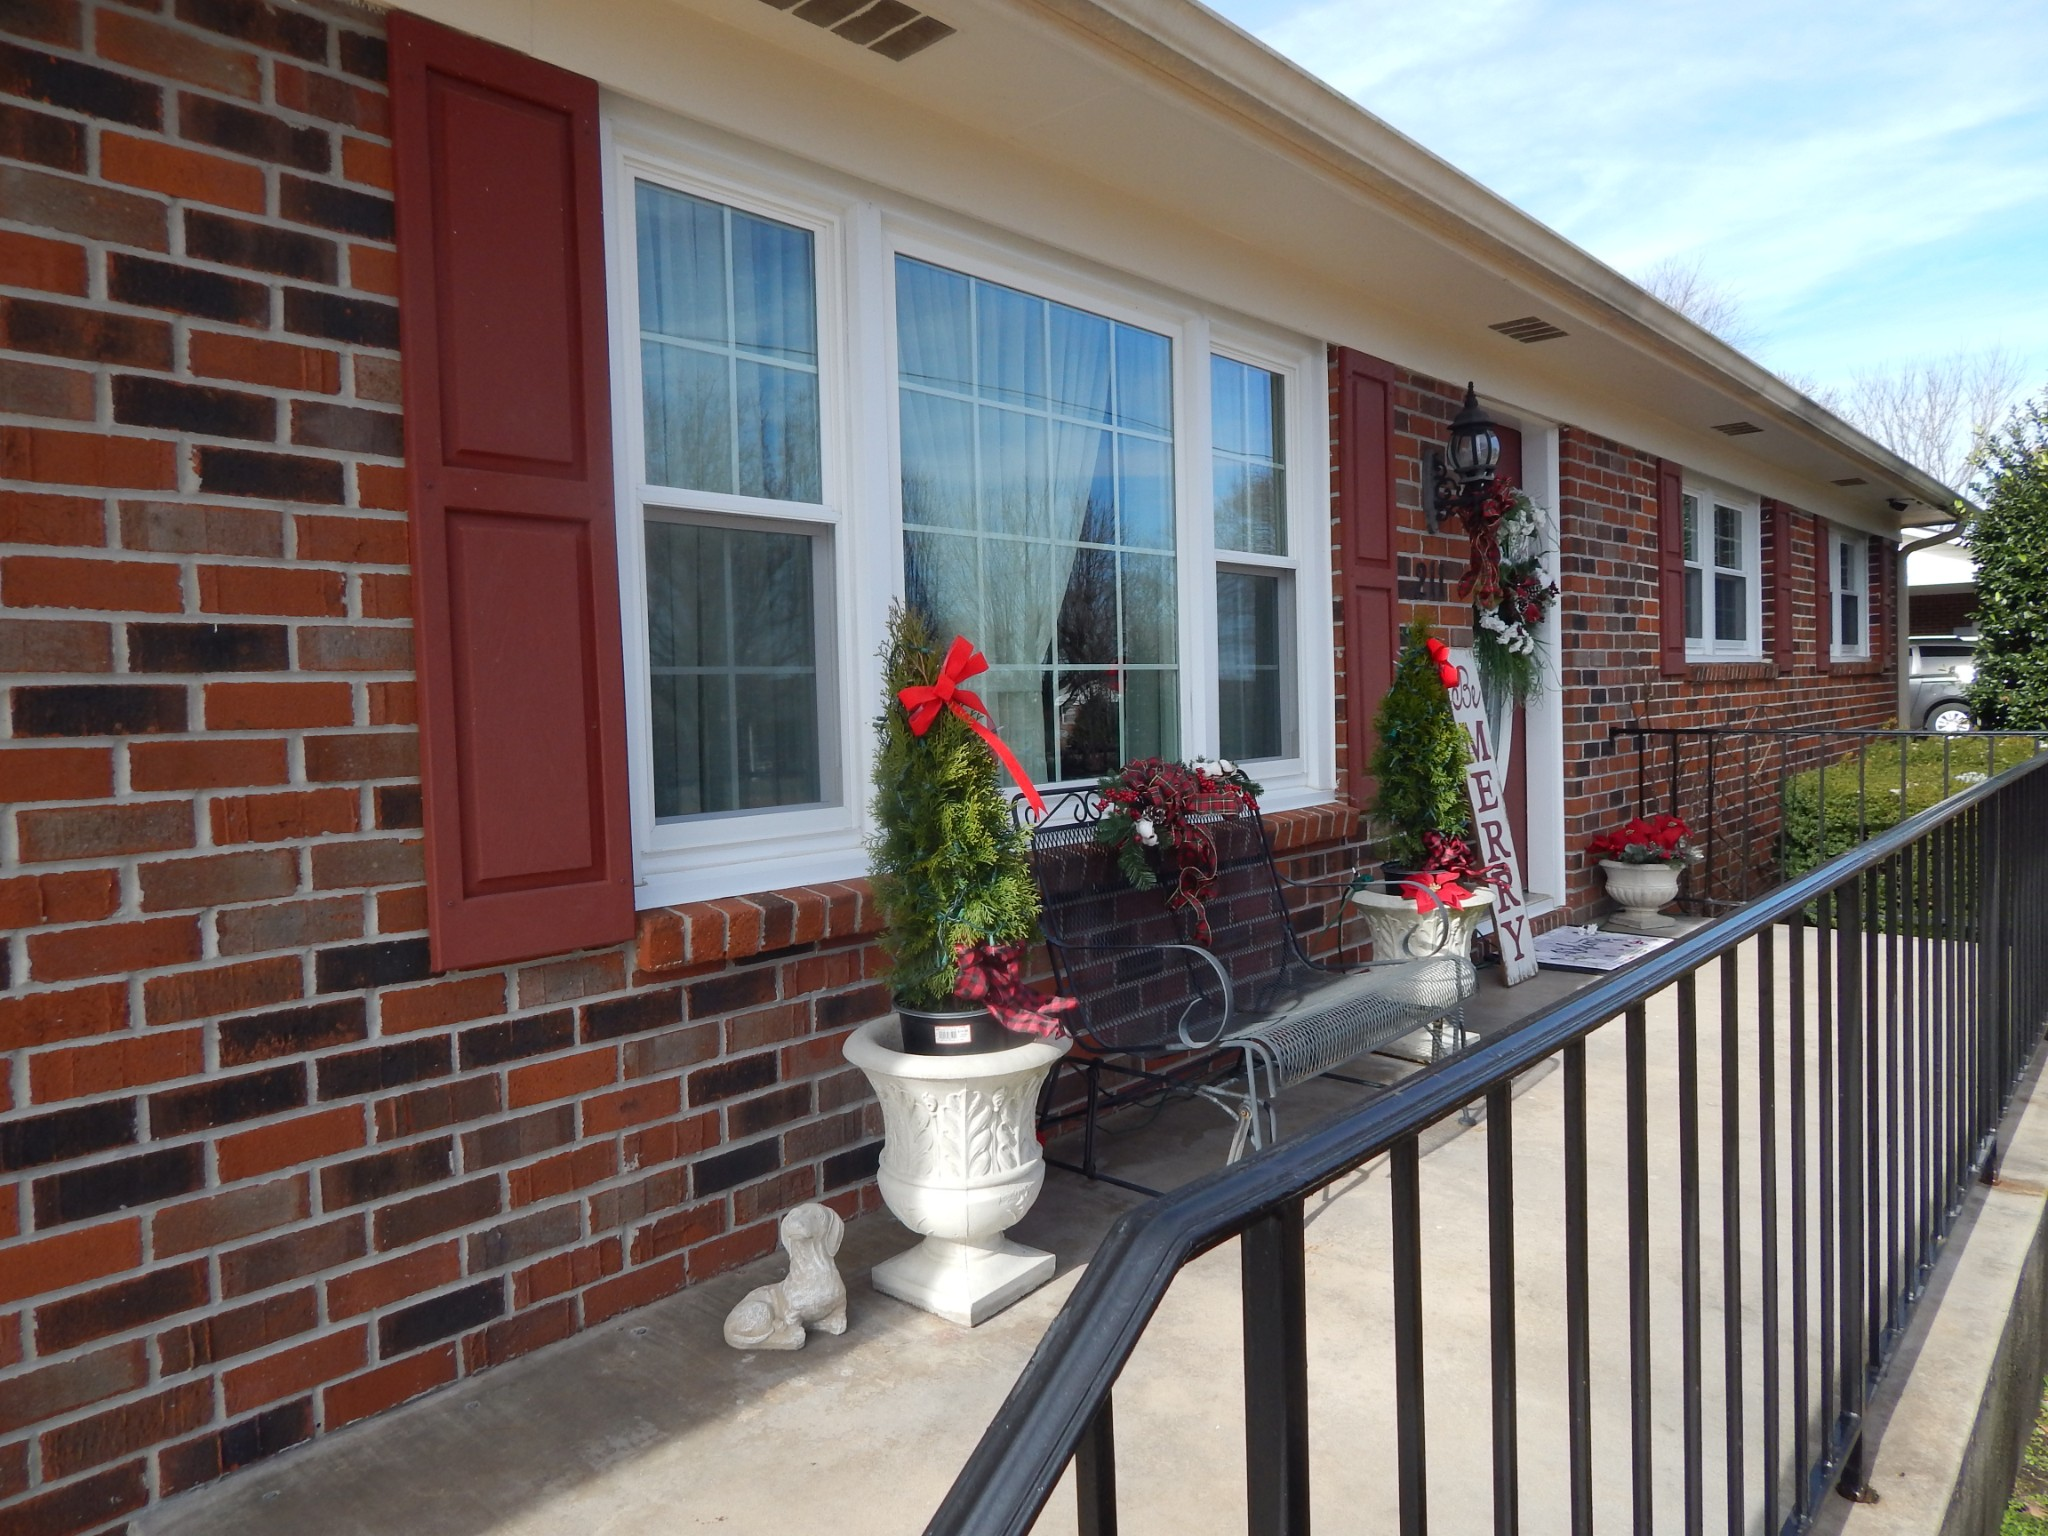 211 Johnson Ave, Huntland, TN 37345 - Huntland, TN real estate listing